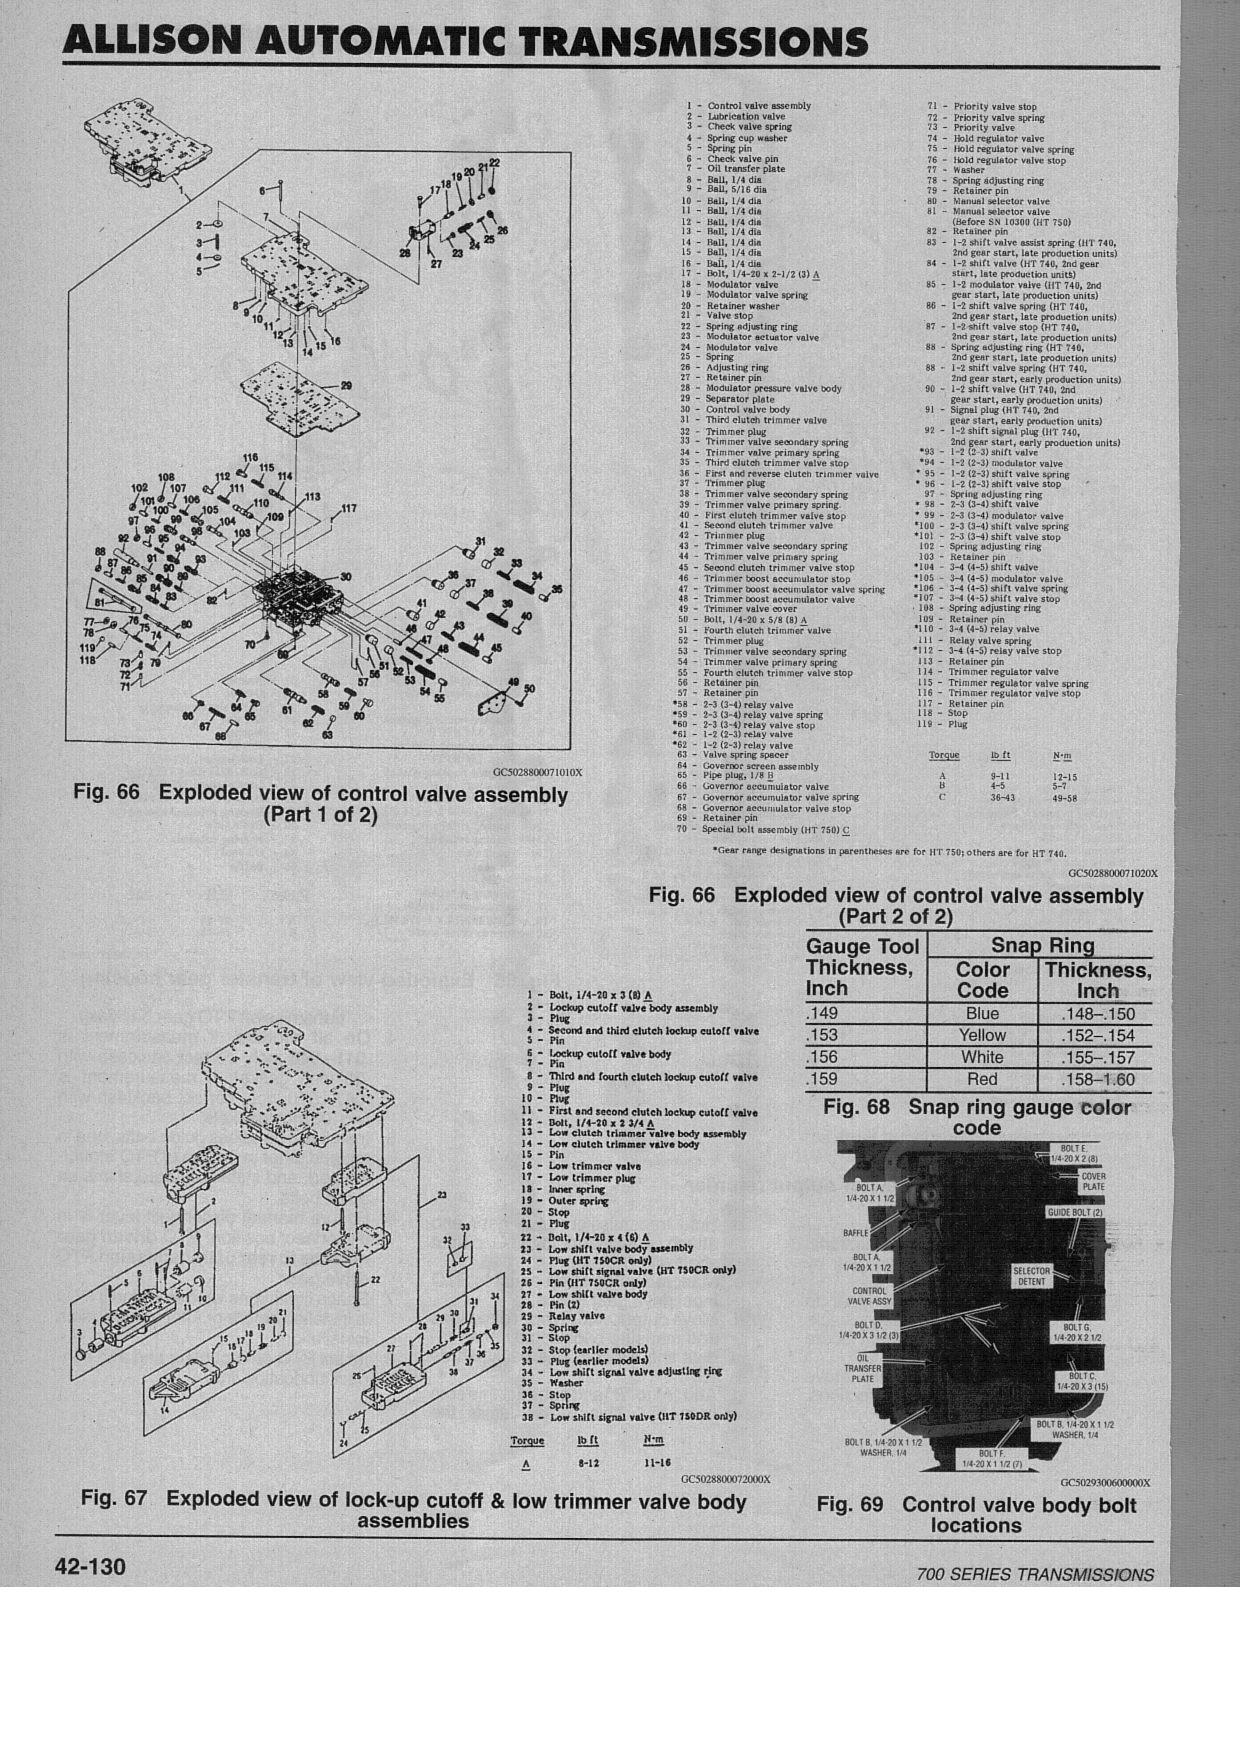 31 Allison 1000 Valve Body Diagram